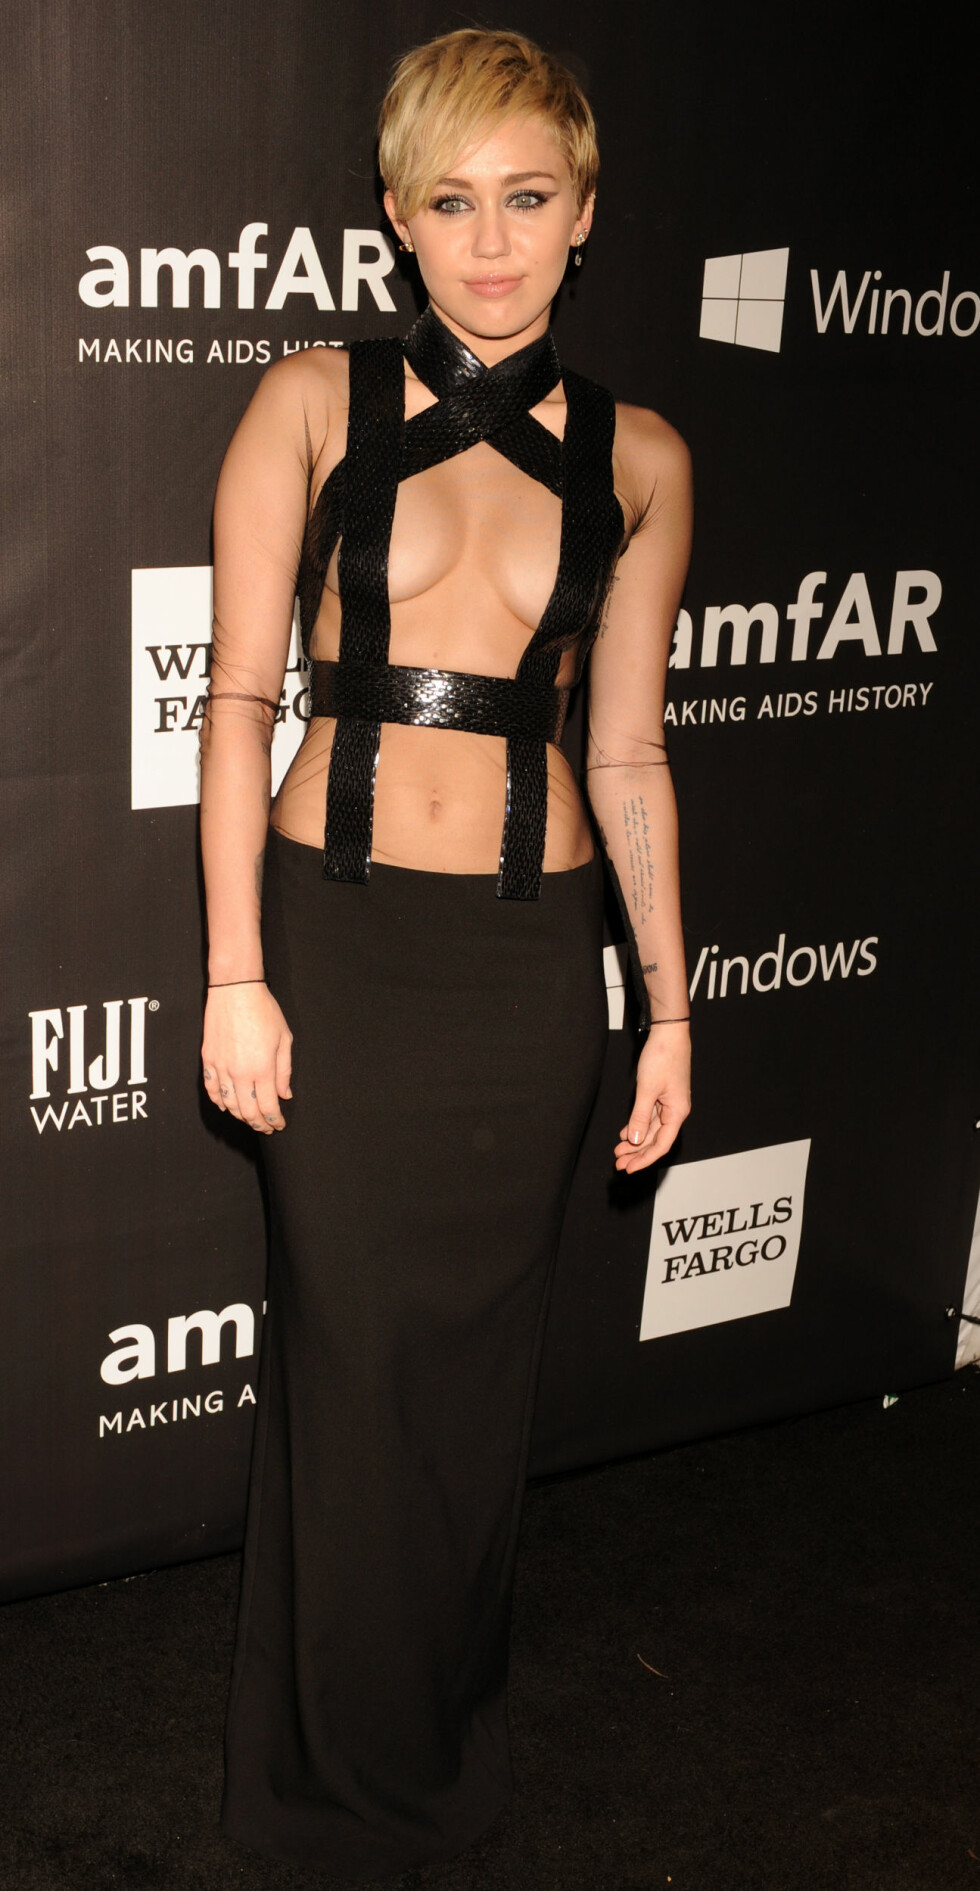 «TOPPLØS» TIL 2: Miley Cyrus viste det meste på amfAR-gallaen i Hollywood i slutten av oktober. Foto: Stella Pictures